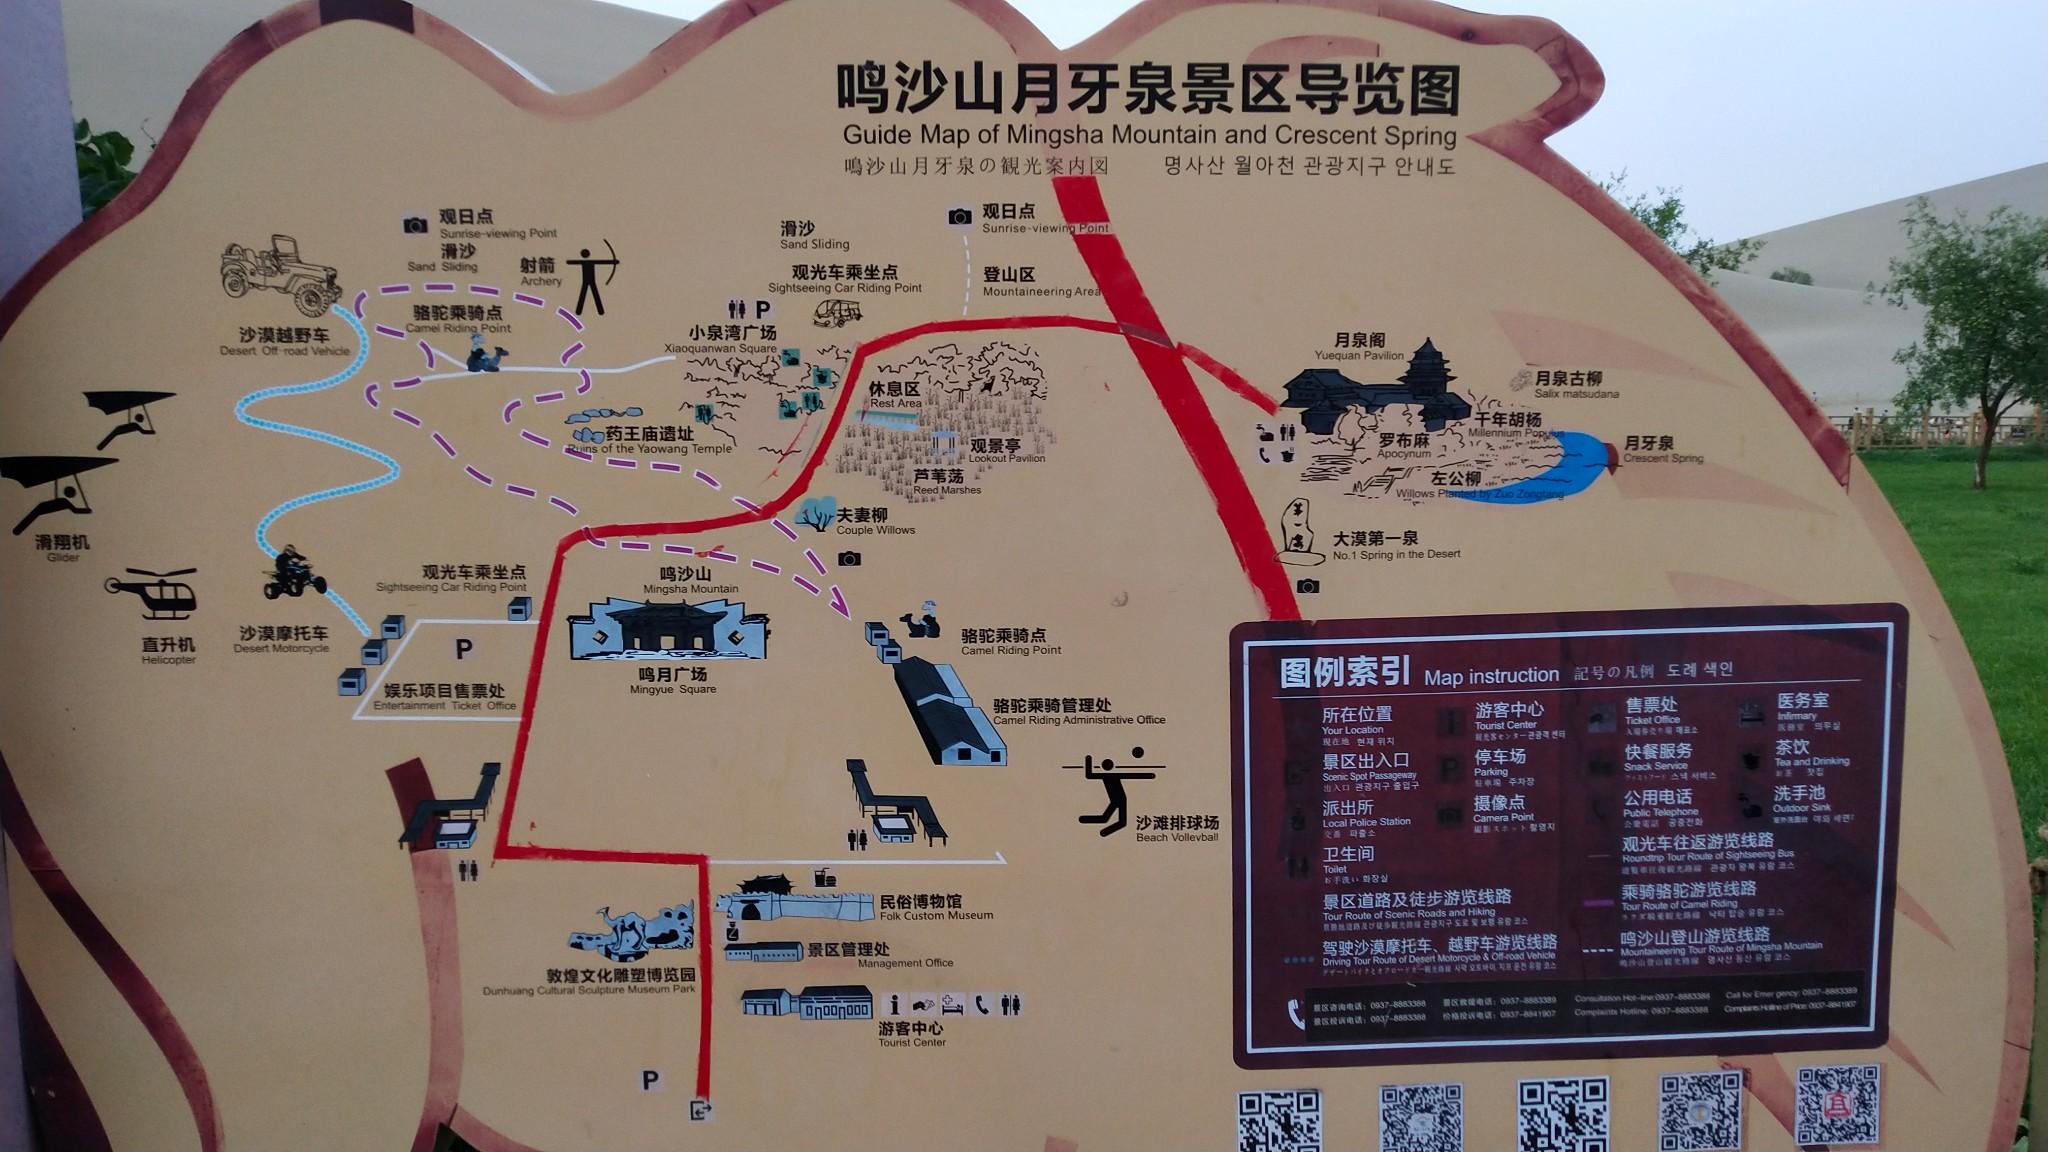 DunHuang mingsha mount